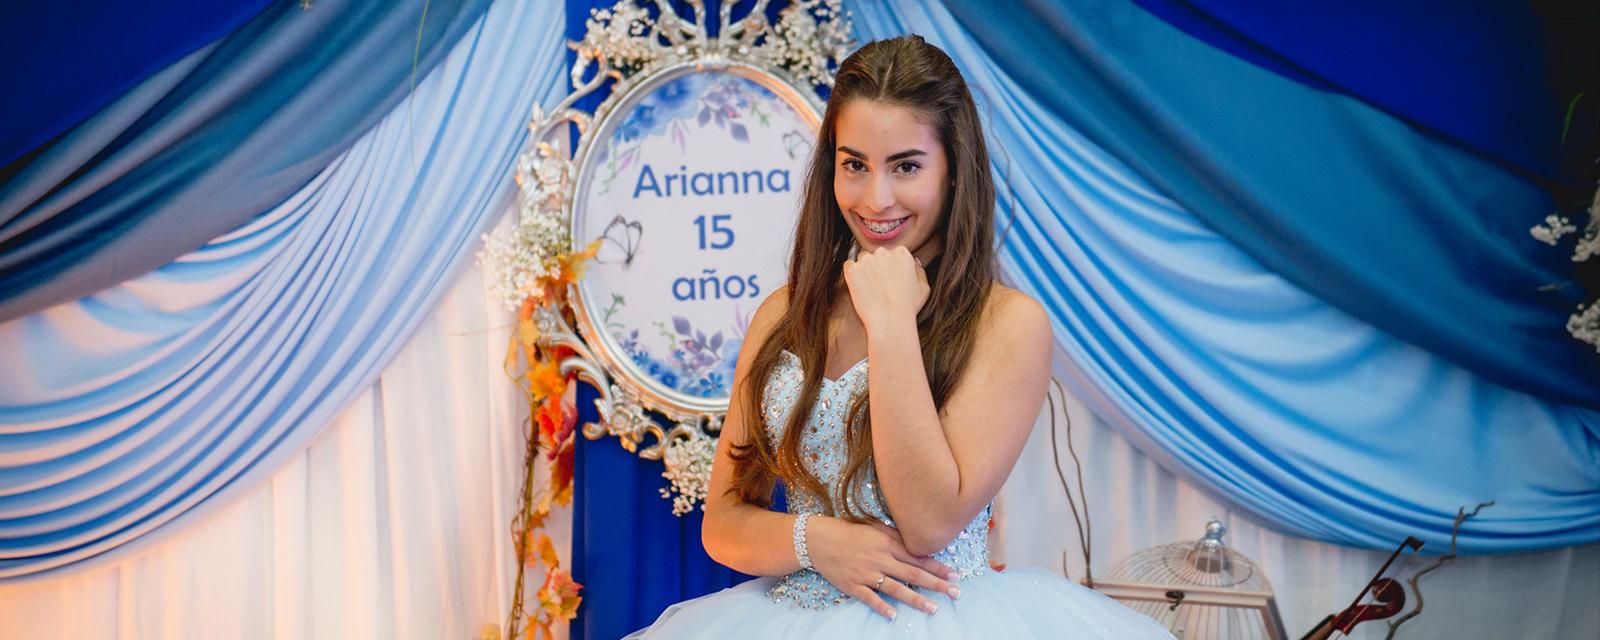 Tomecano7 - Fiesta de 15